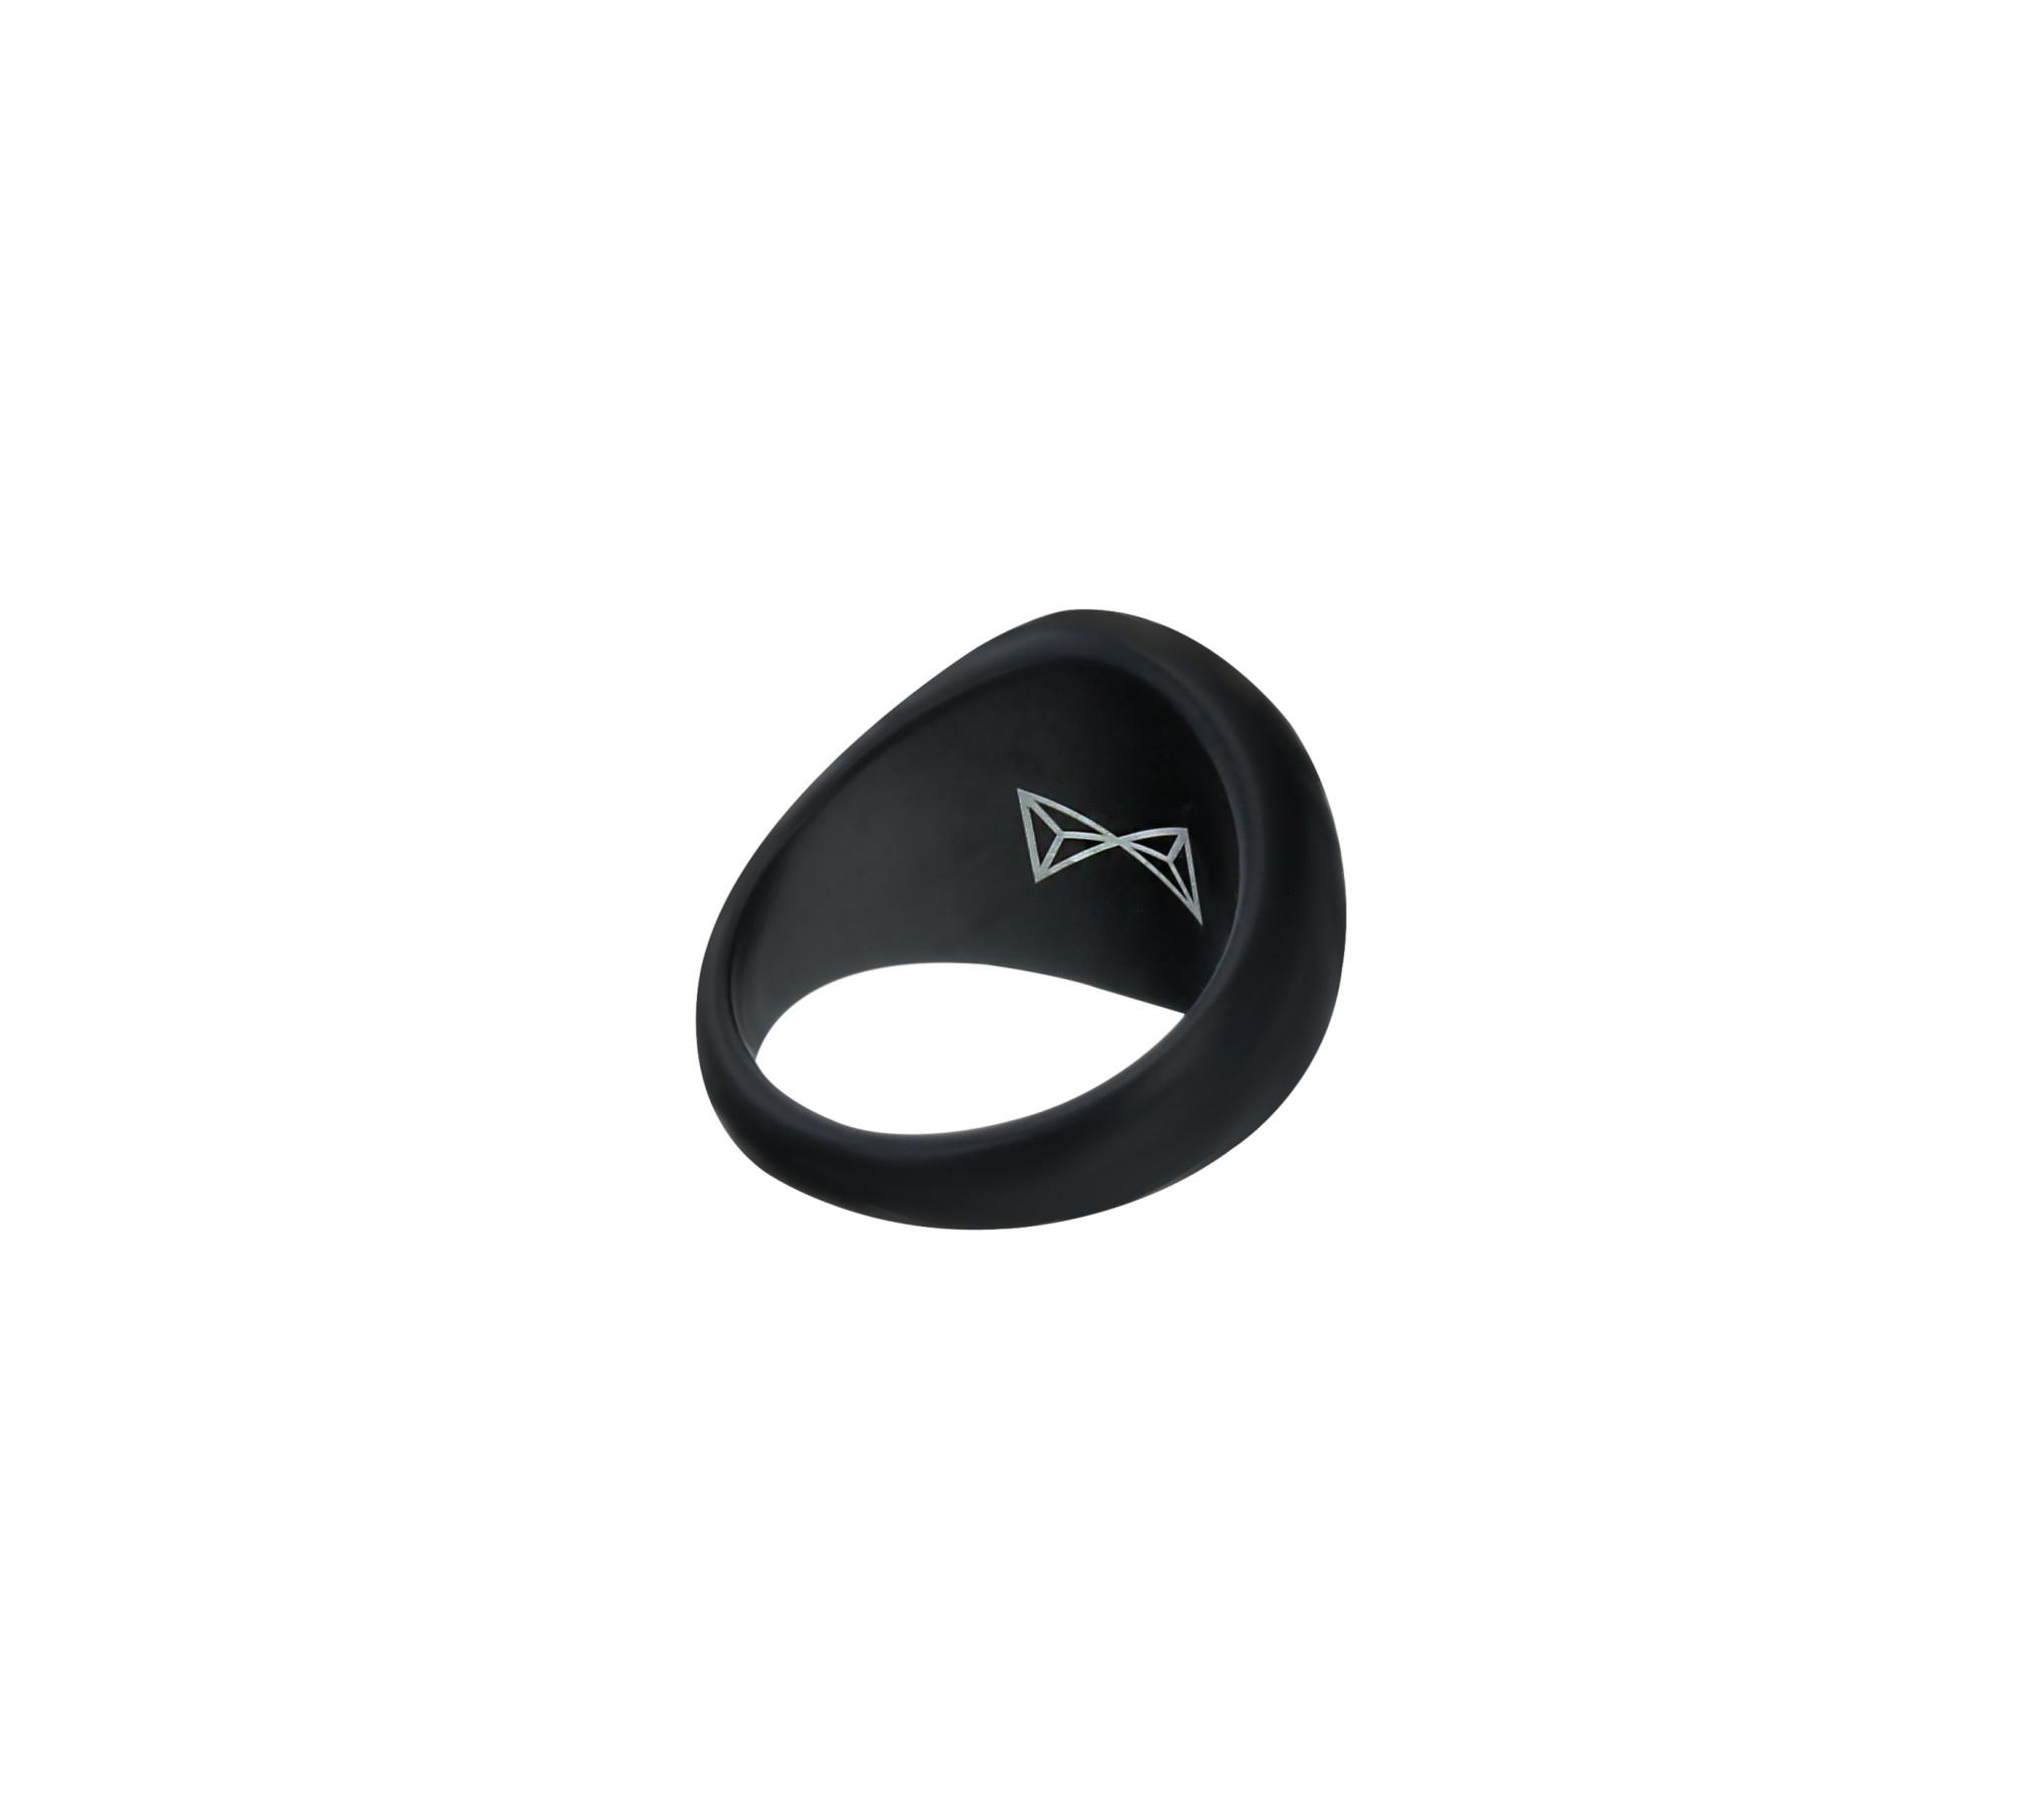 AZE Jewels ⋈ AZE Jewels Ring AZ-RG002-B-019